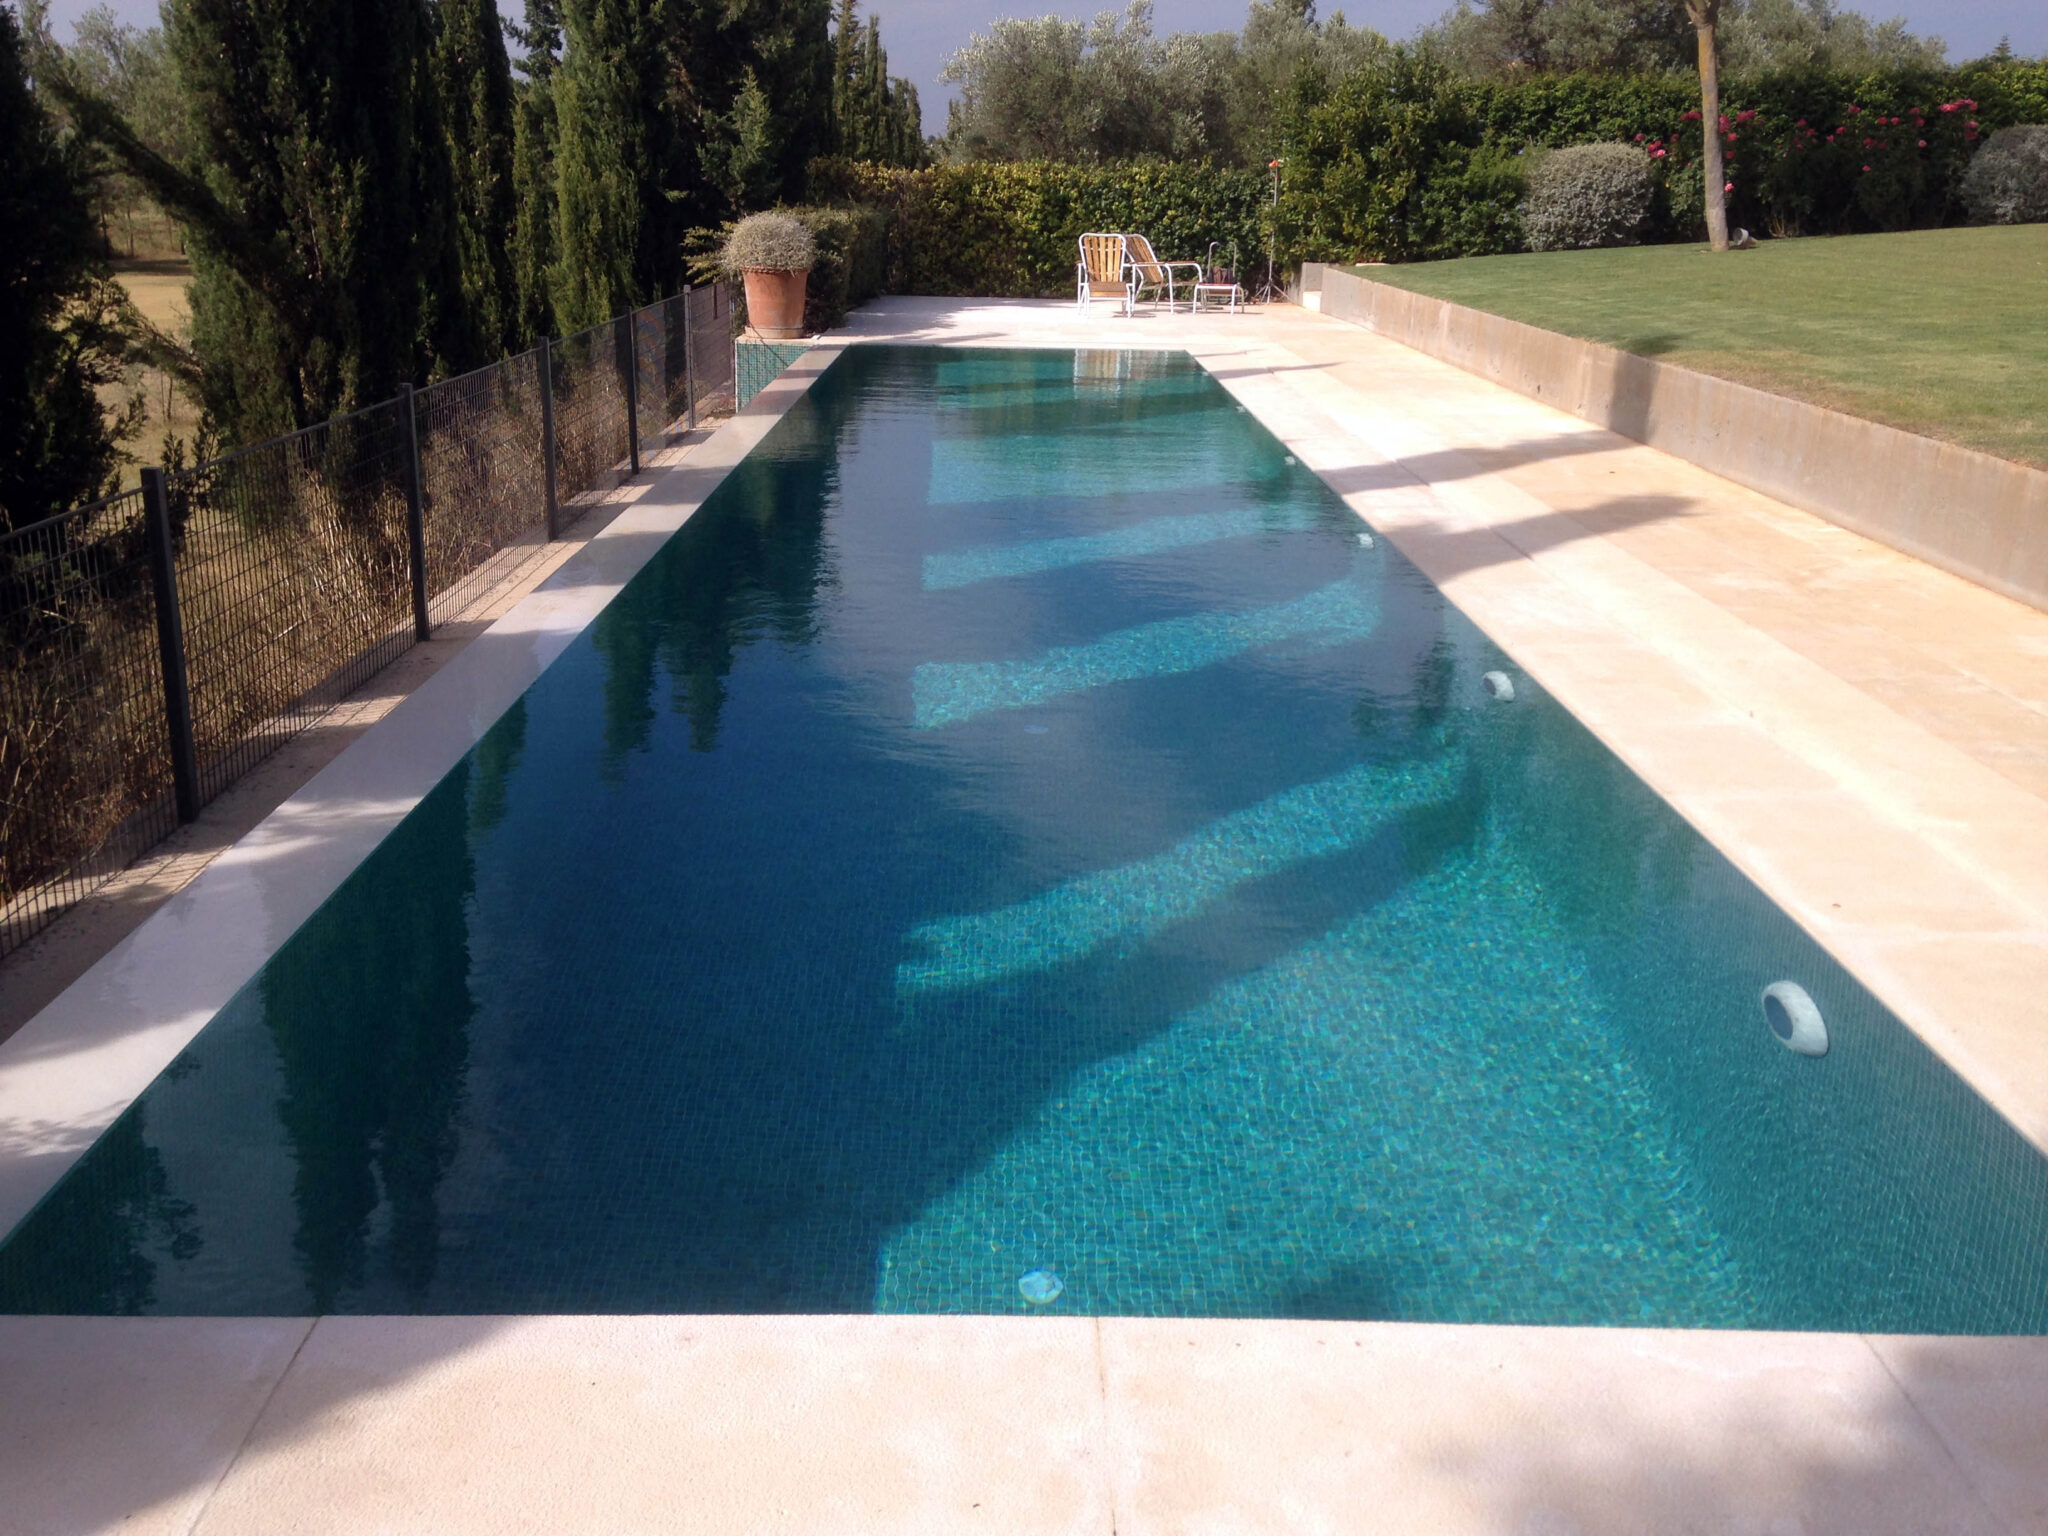 Proyecto-hisbalit-Adriático-Eloy-Adriatico-11-scaled